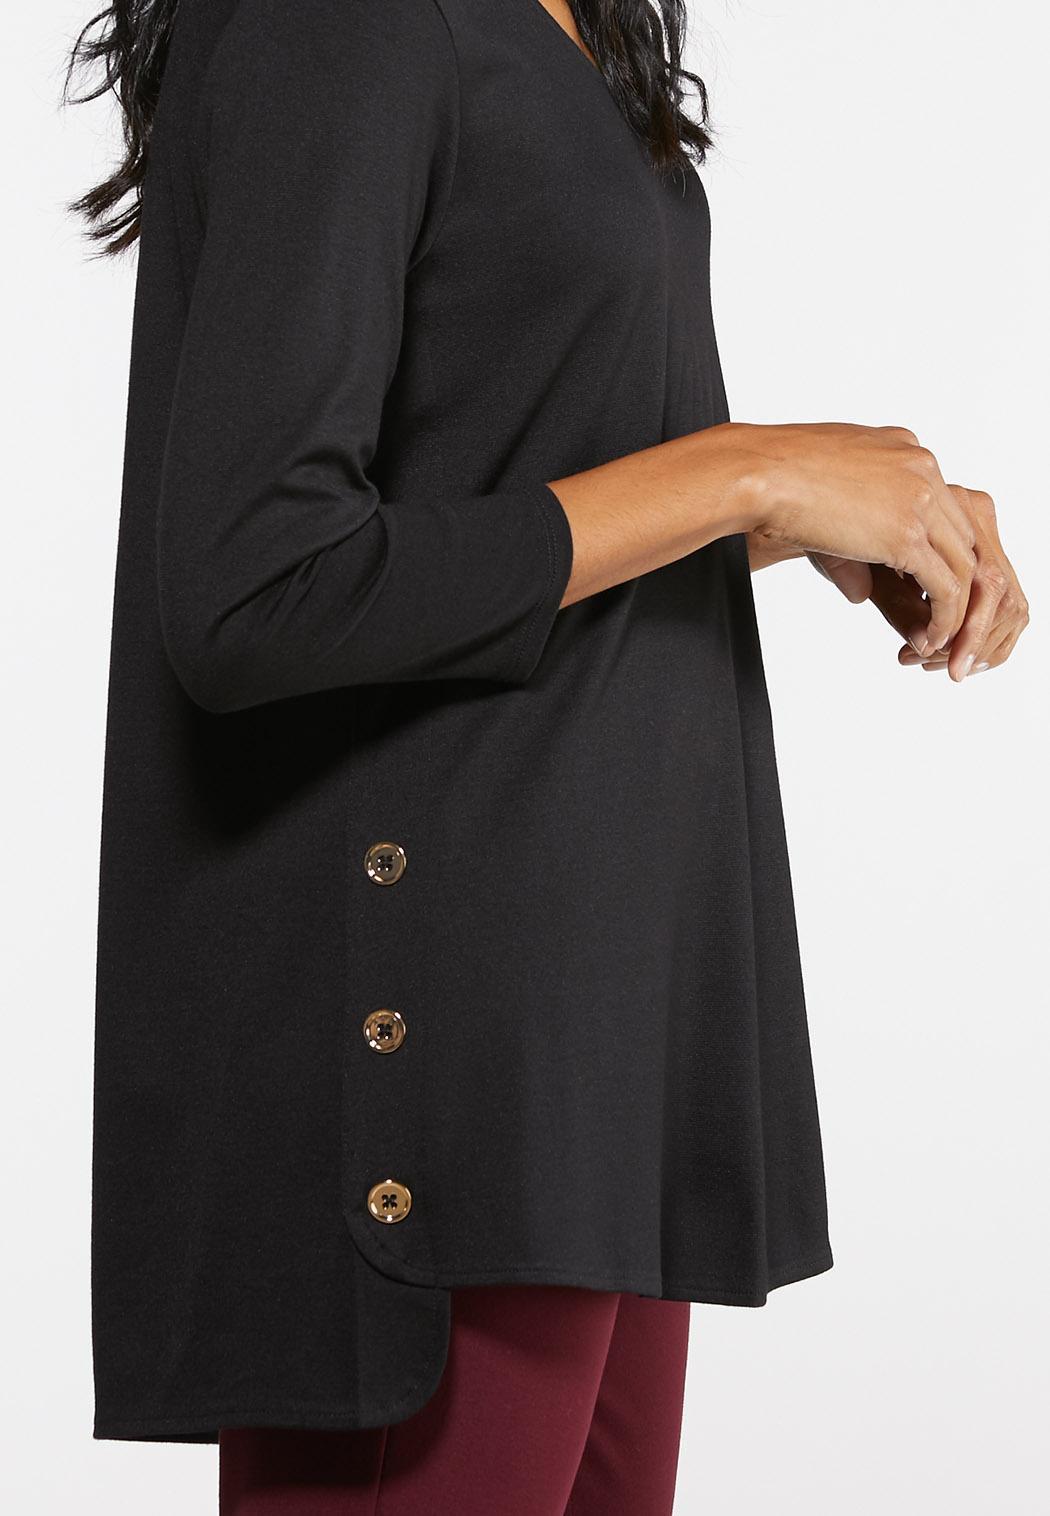 Plus Size Side Button Ponte Top (Item #43974468)